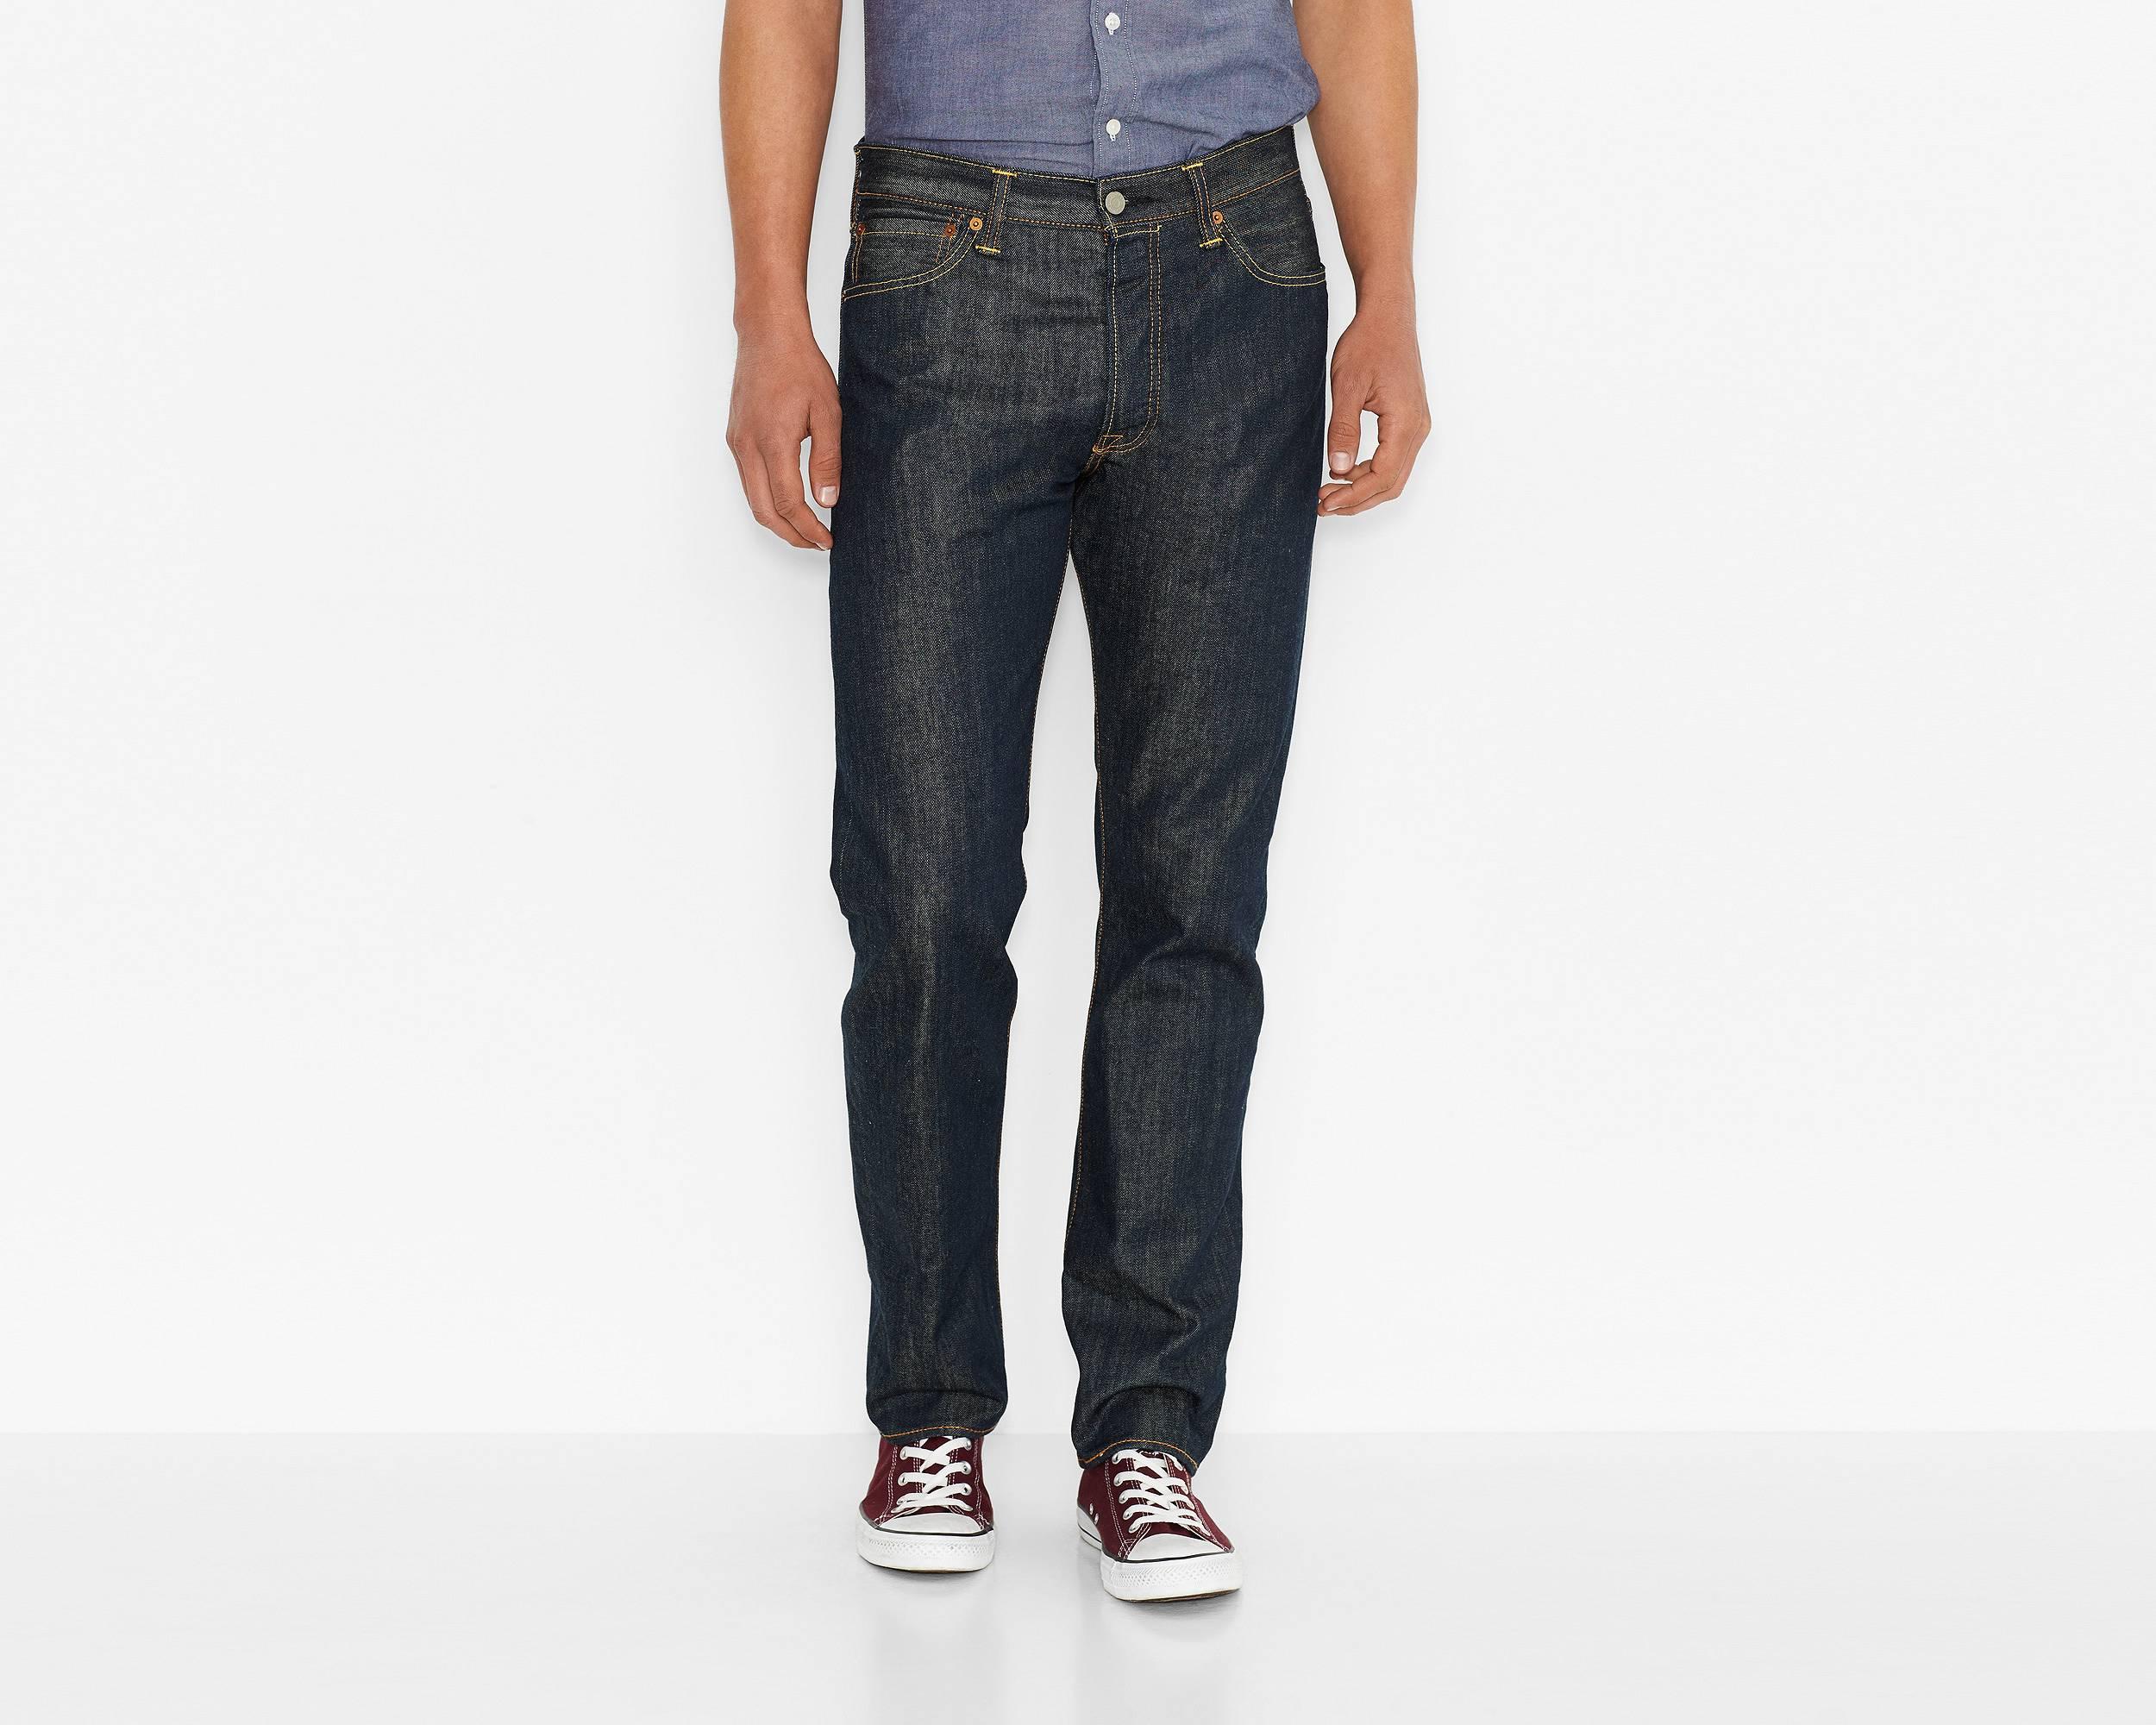 501 original fit jeans marlon levi 39 s great britain uk. Black Bedroom Furniture Sets. Home Design Ideas